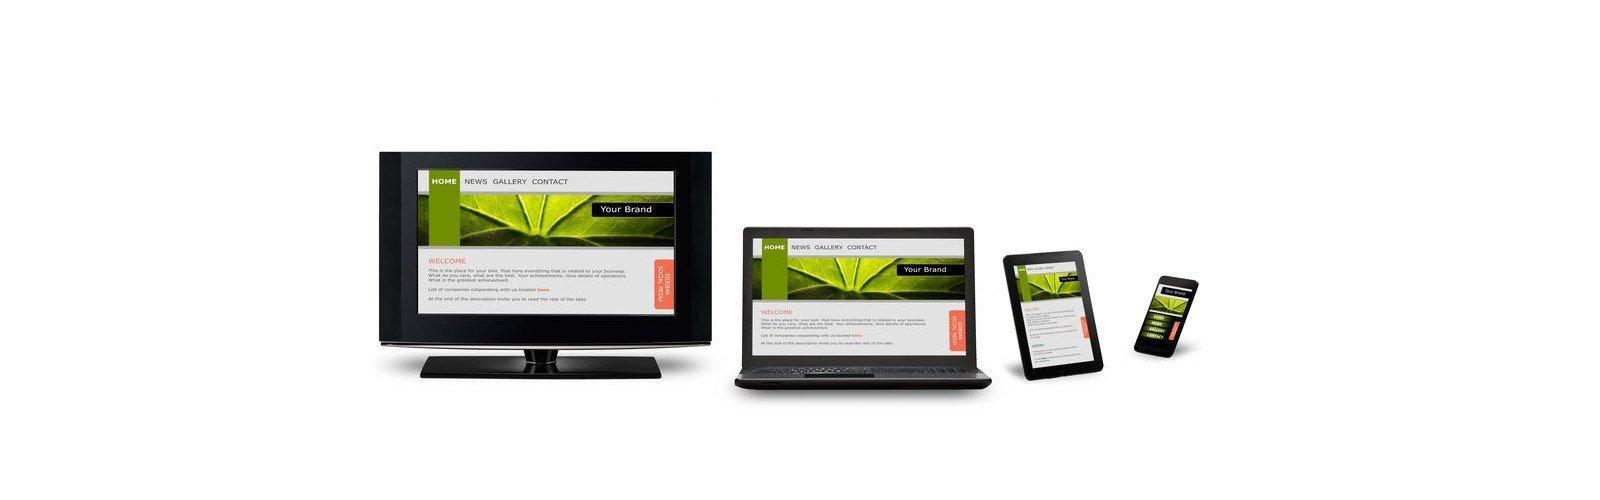 DFW Business Websites - SEO Digital Marketing, Mobile Responsive Websites